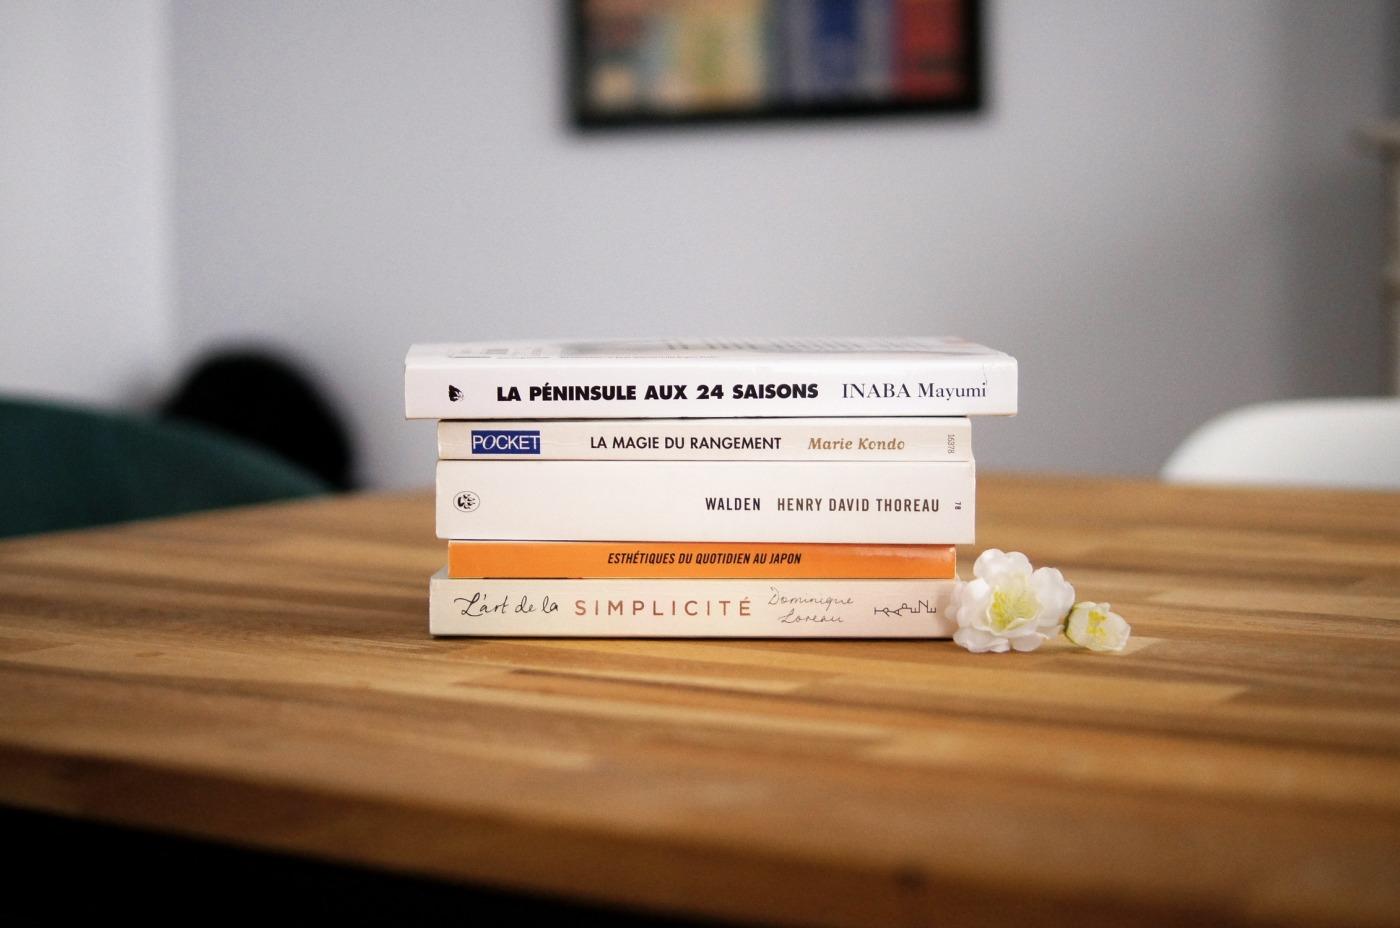 Des livres minimalistes